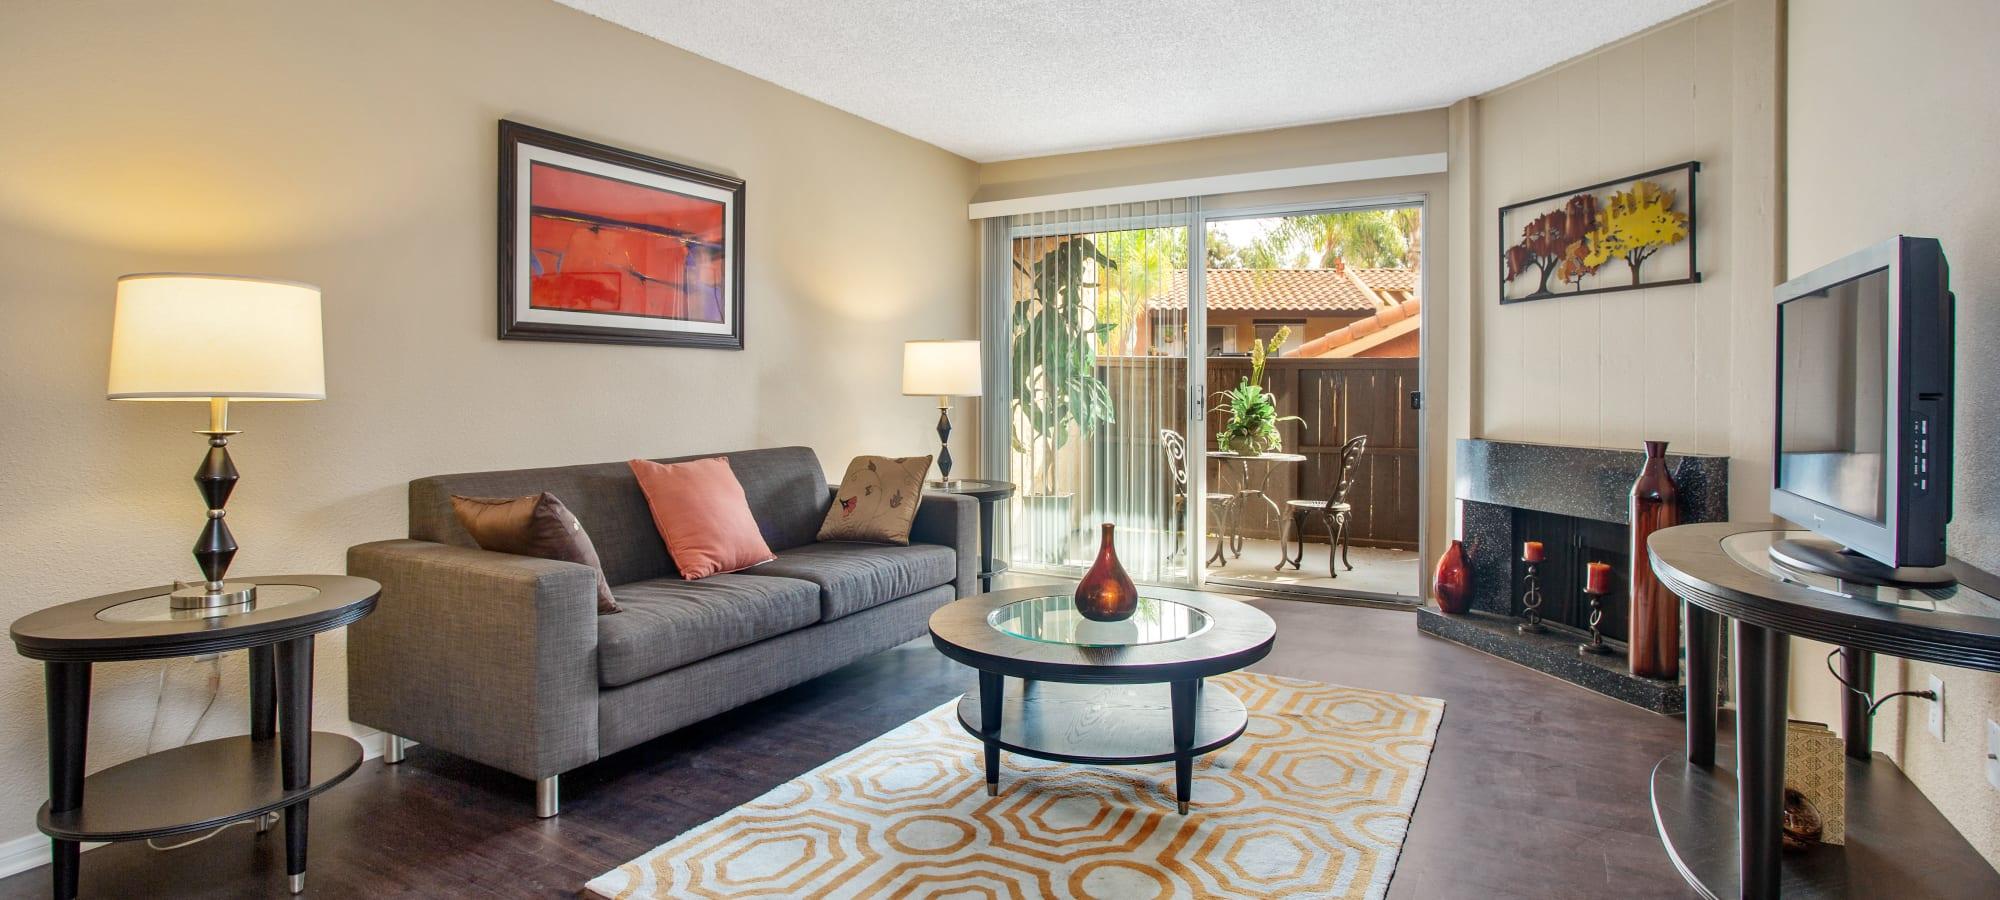 Oceanside, California apartments at Shadow Ridge Apartments